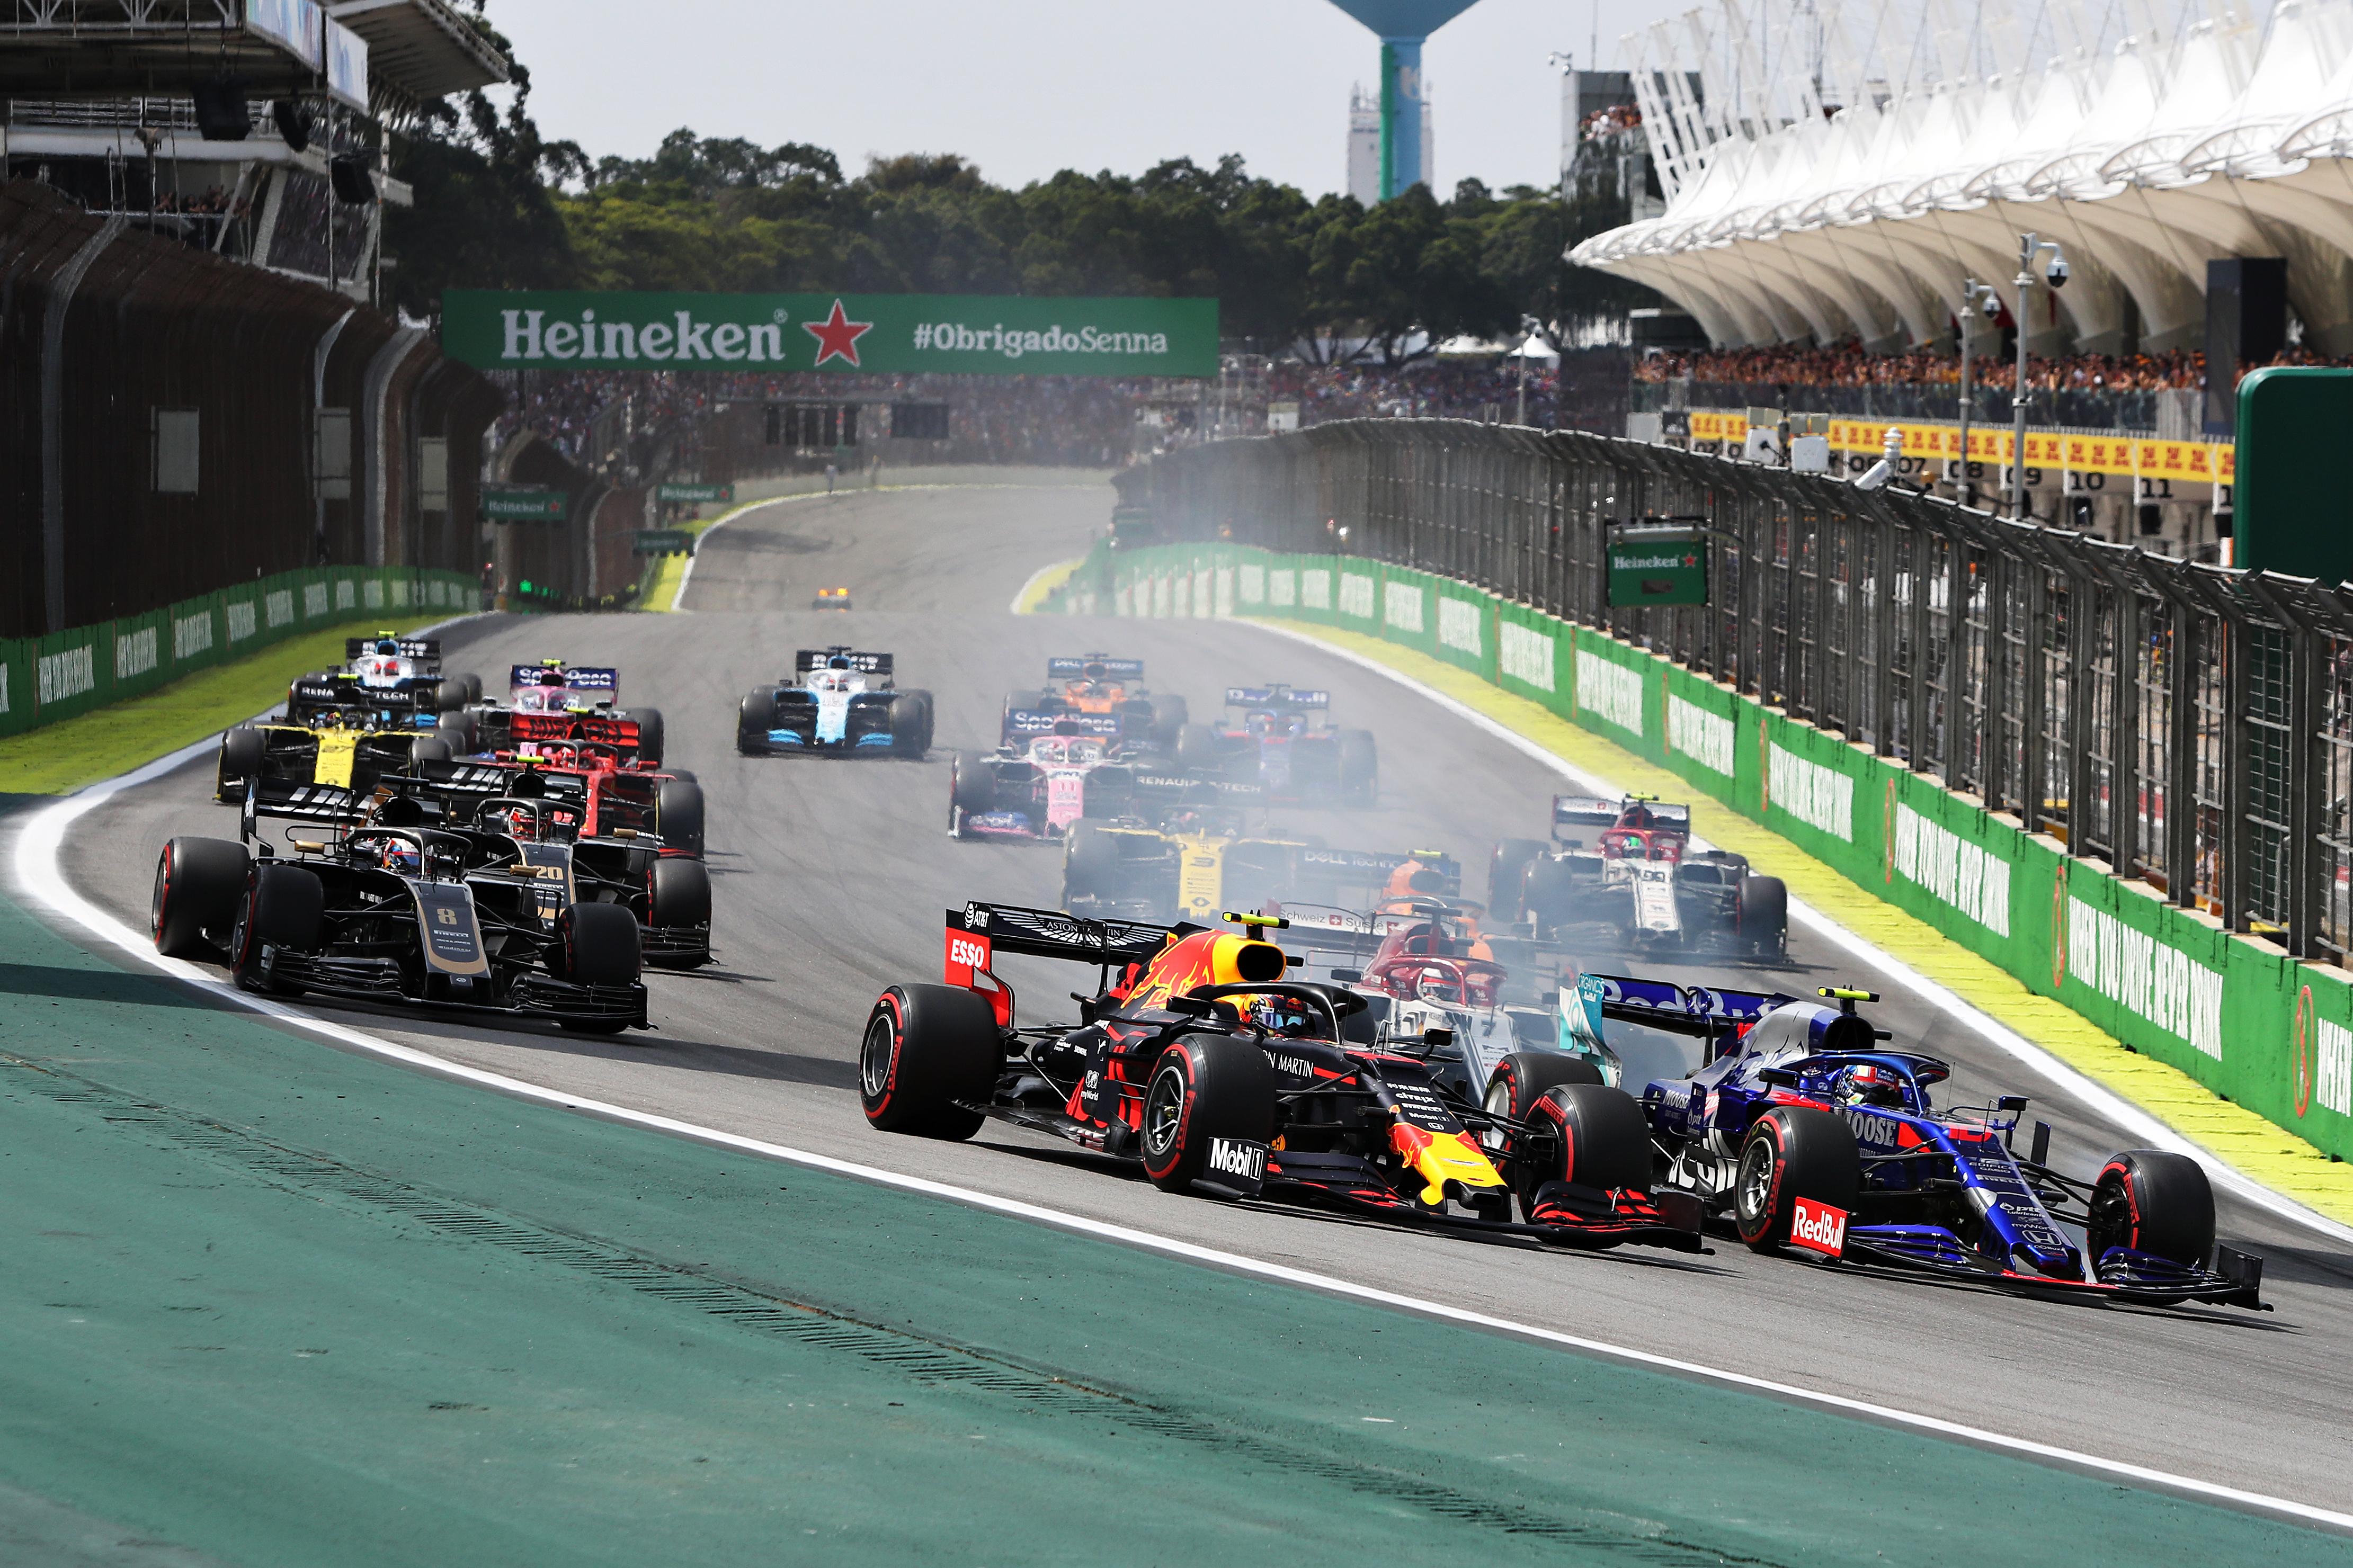 F1 plans 'normal' 23-race calendar for 2021